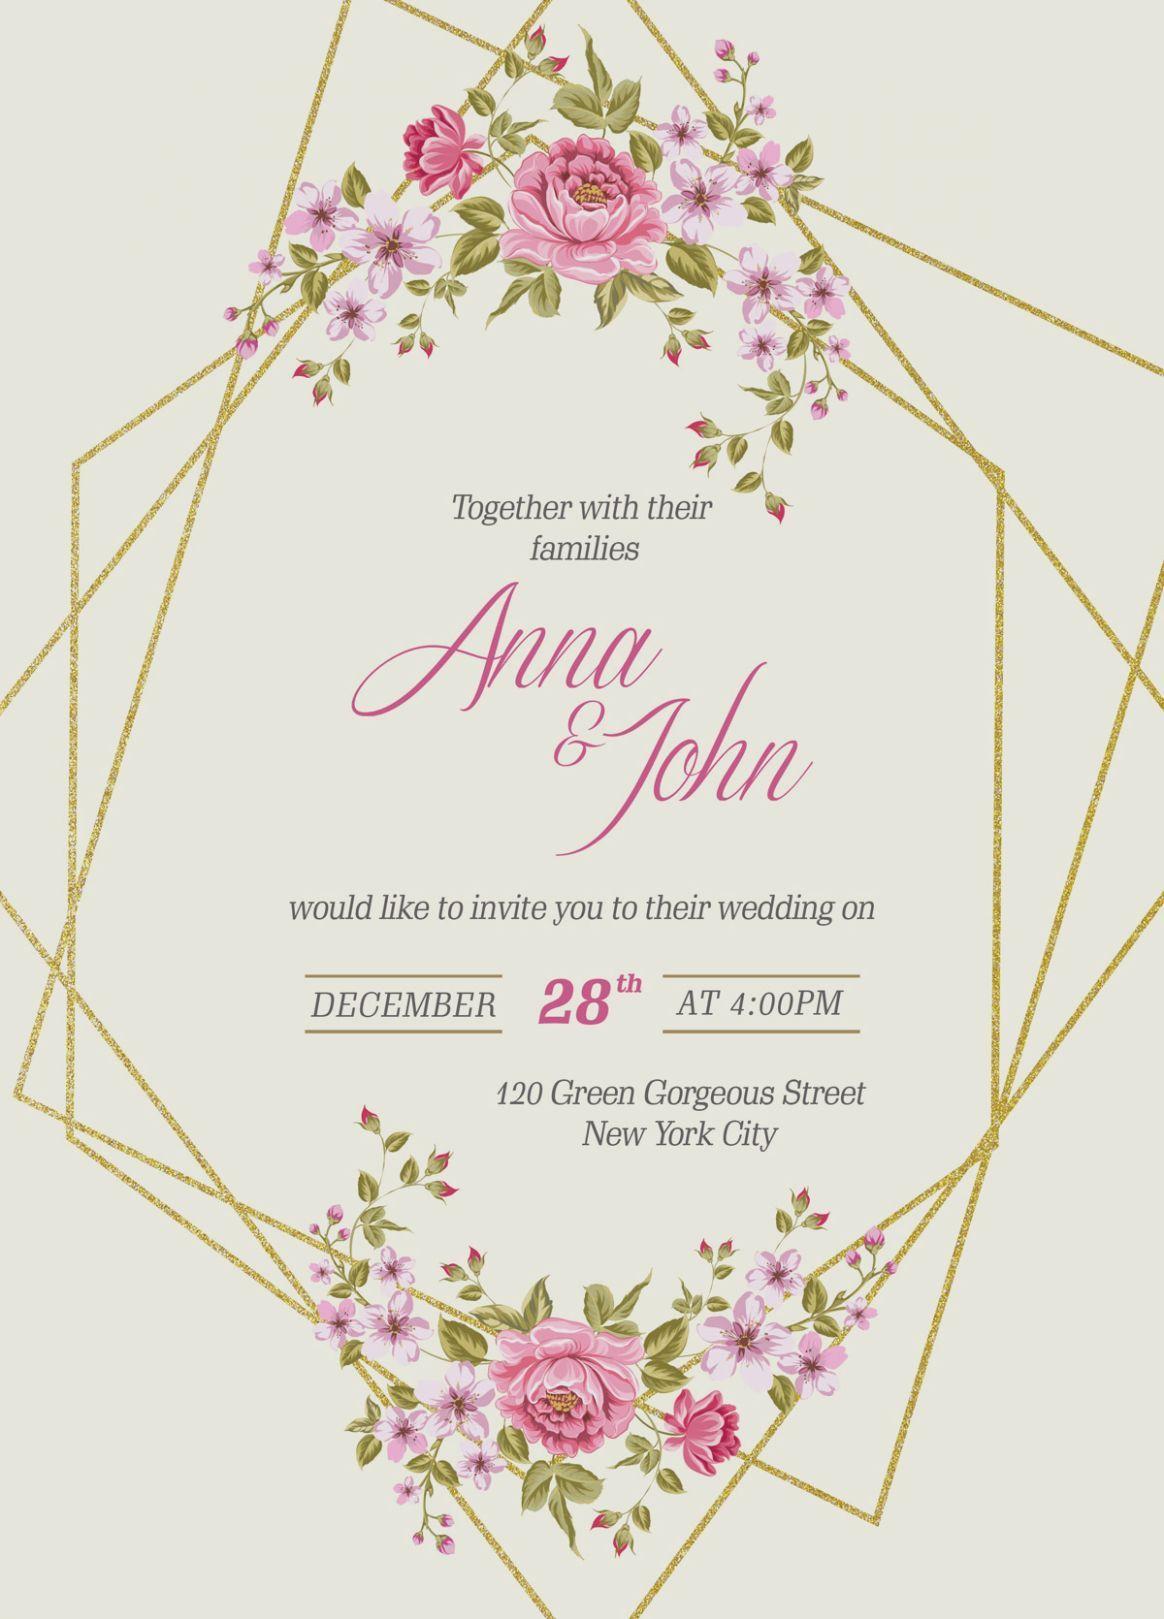 6 Wedding Card Invitation Template Free Wedding Invitation Templates Free Printable Wedding Invitations Wedding Invitations Printable Templates